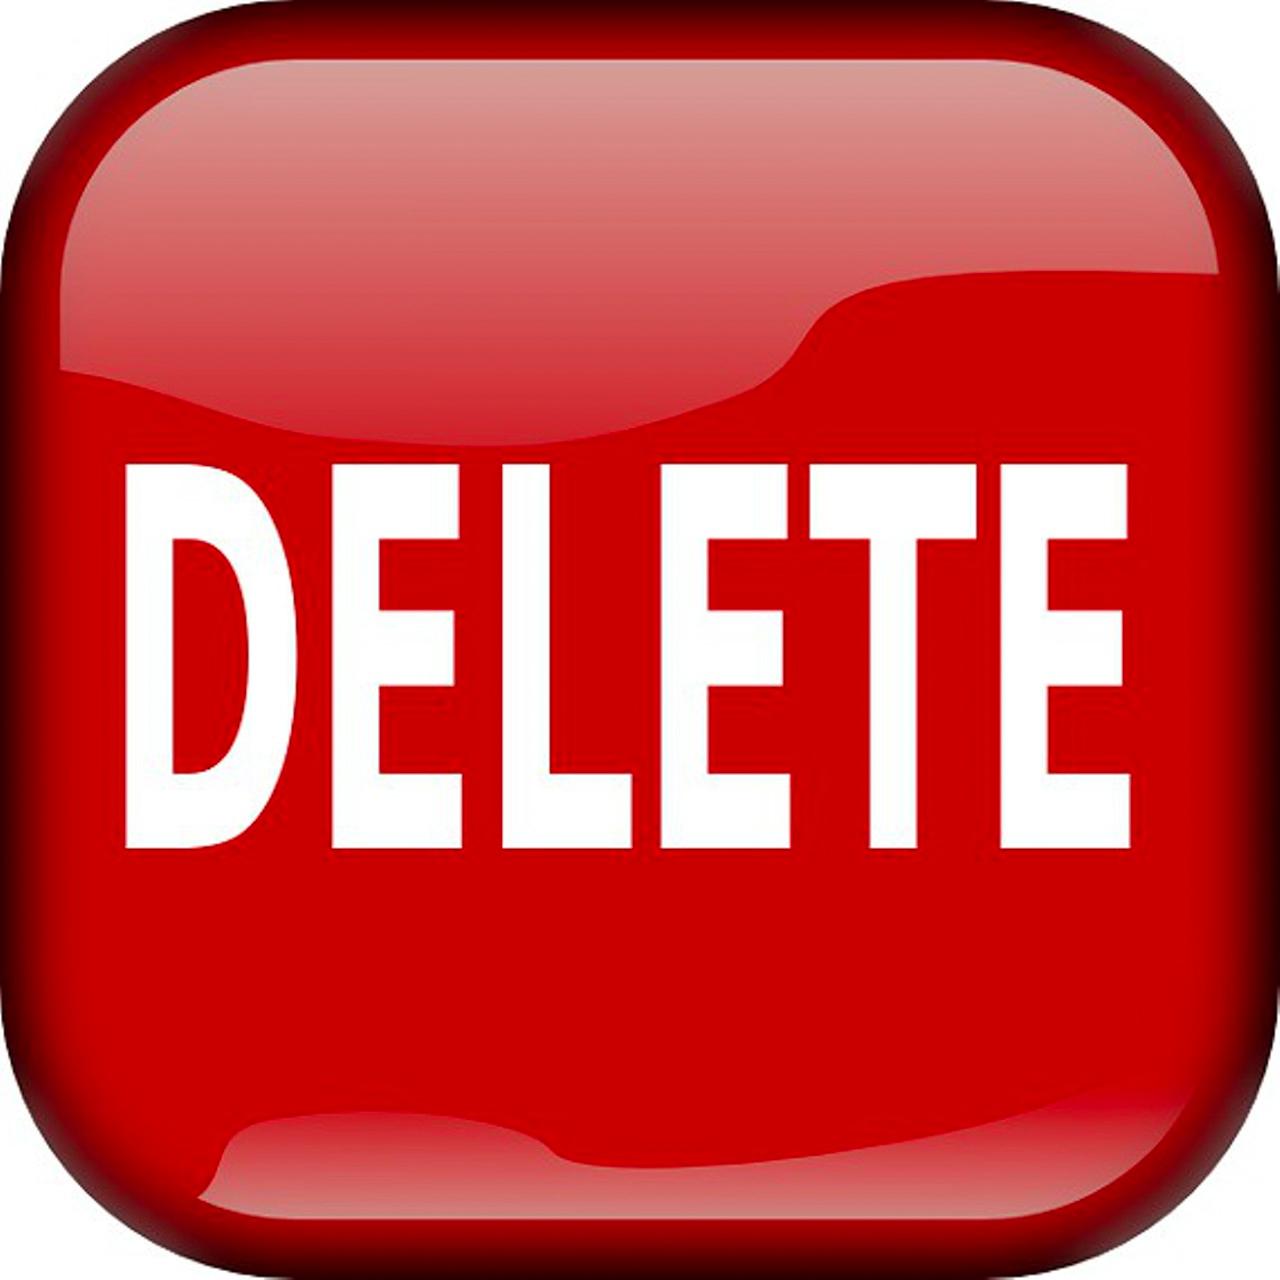 Image: Delete icon